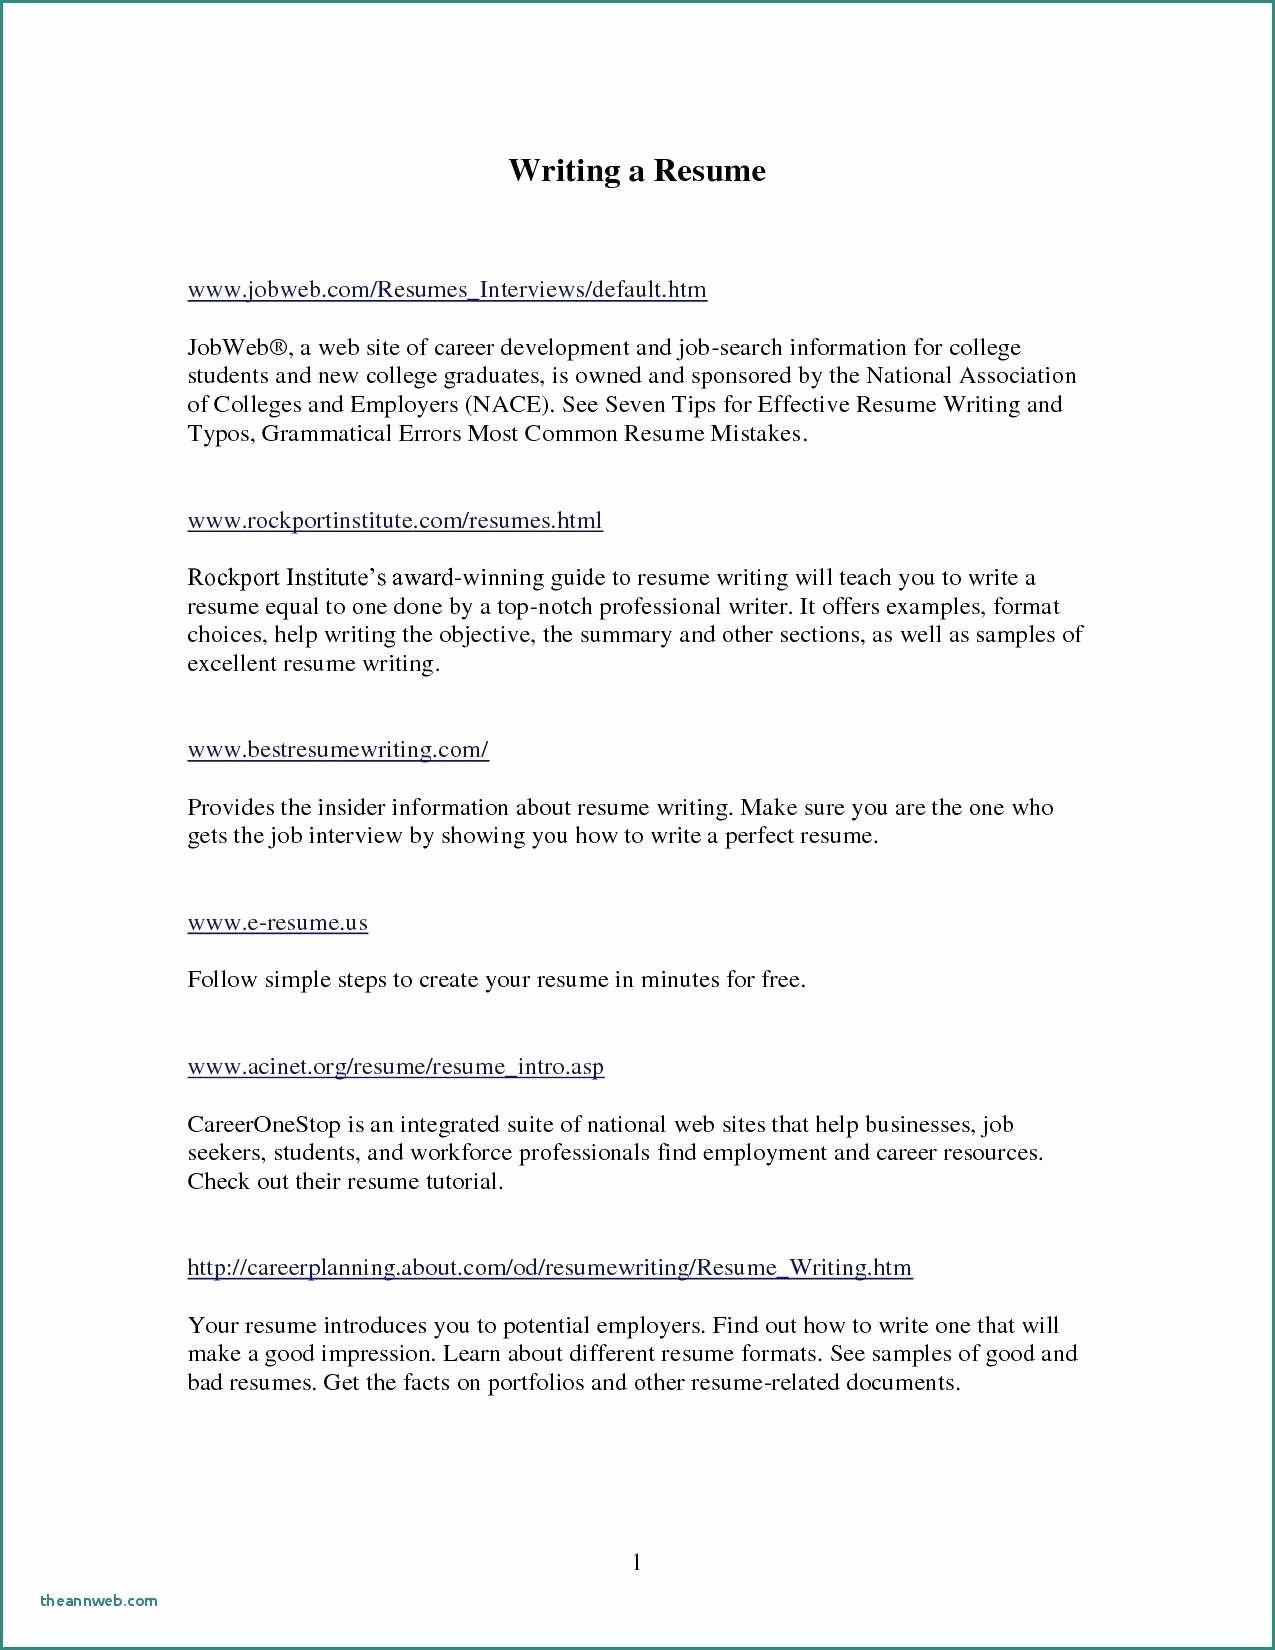 Business School Recommendation Letter Sample Elegant New Re Mendation Letter Template Business School